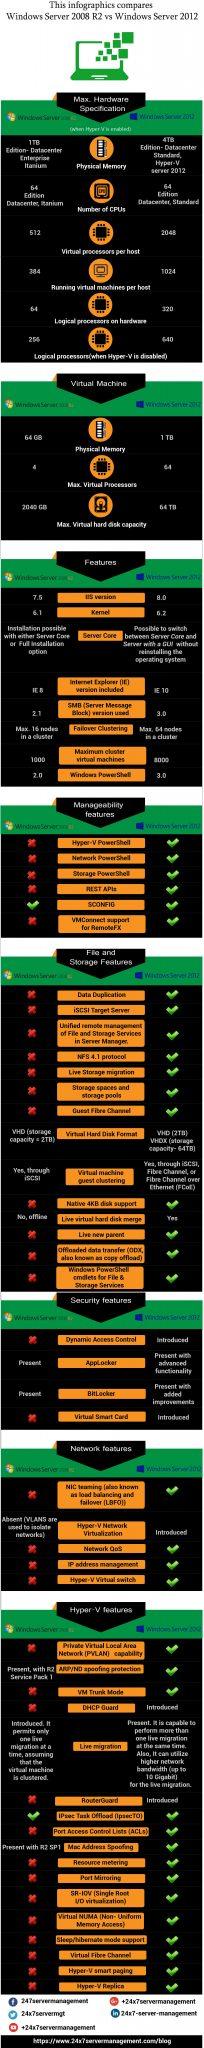 windows server 2008r2 vs 2012